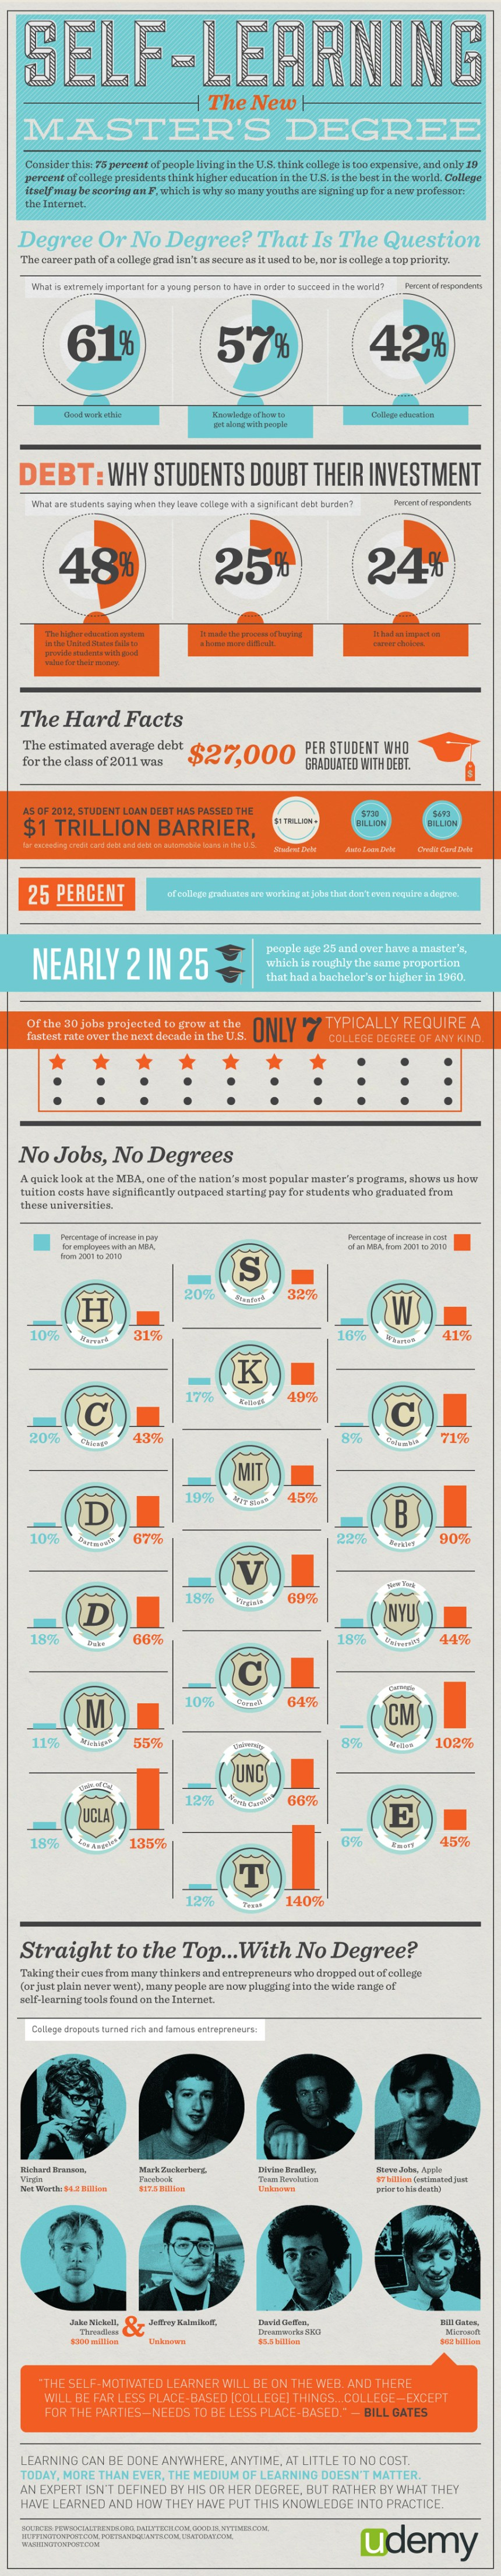 ¿Es mejor estudiar una carrera o no?